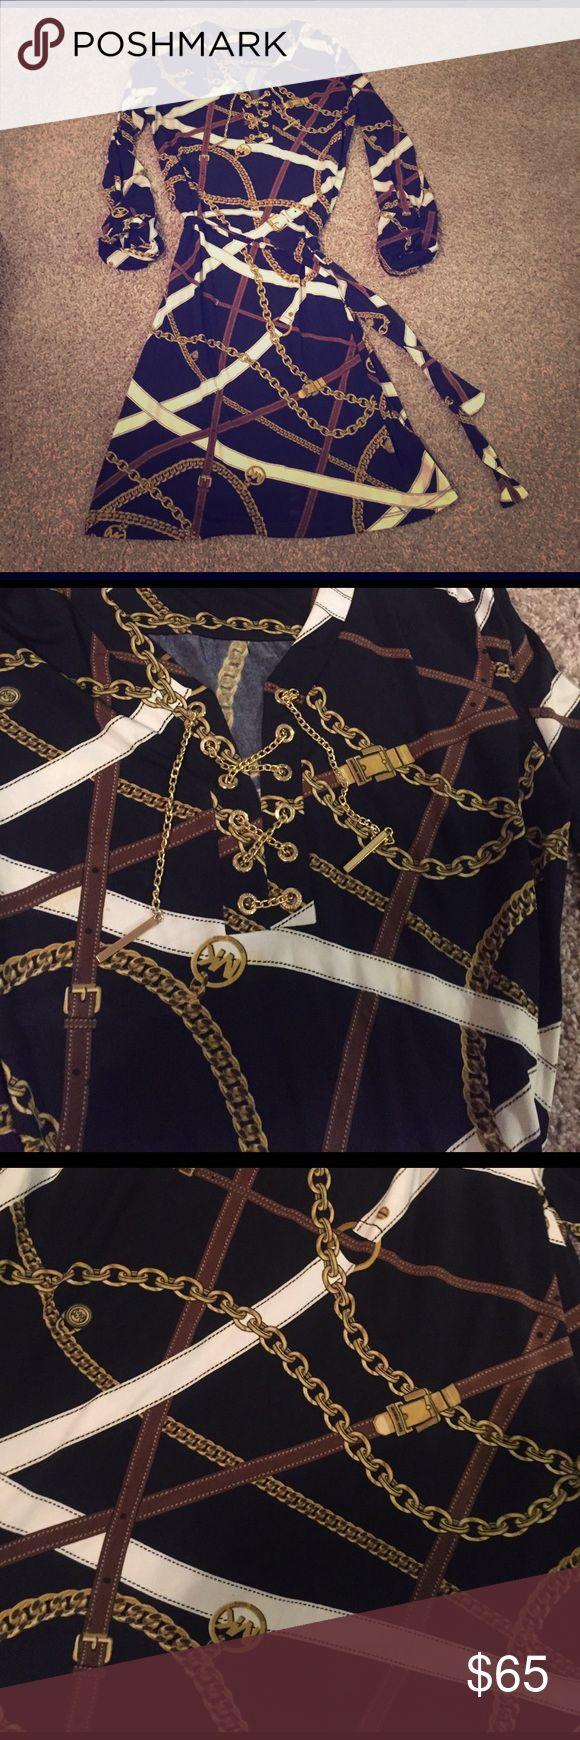 MICHAEL KORS CHAIN DRESS Michael Kors gold accent chained up dress. Belted. Michael Kors Dresses Long Sleeve